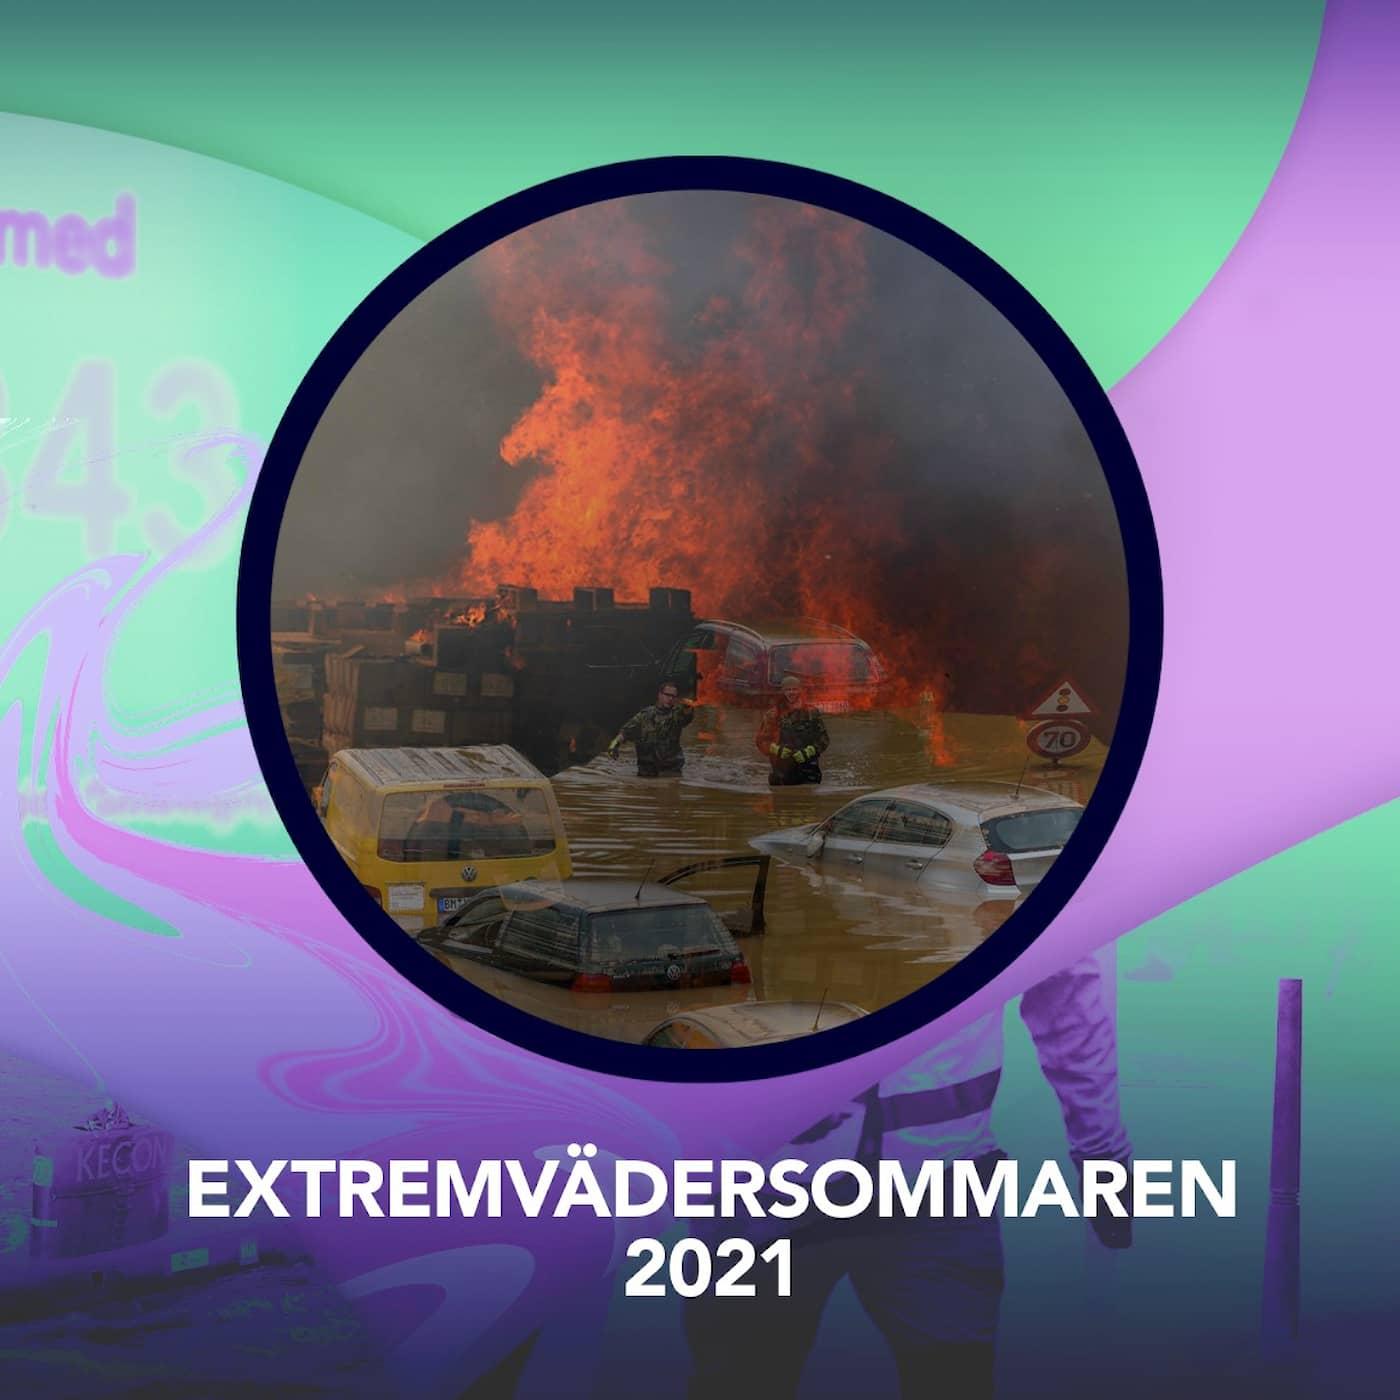 Extremvädersommaren 2021 – P3 Nyheter Dokumentär